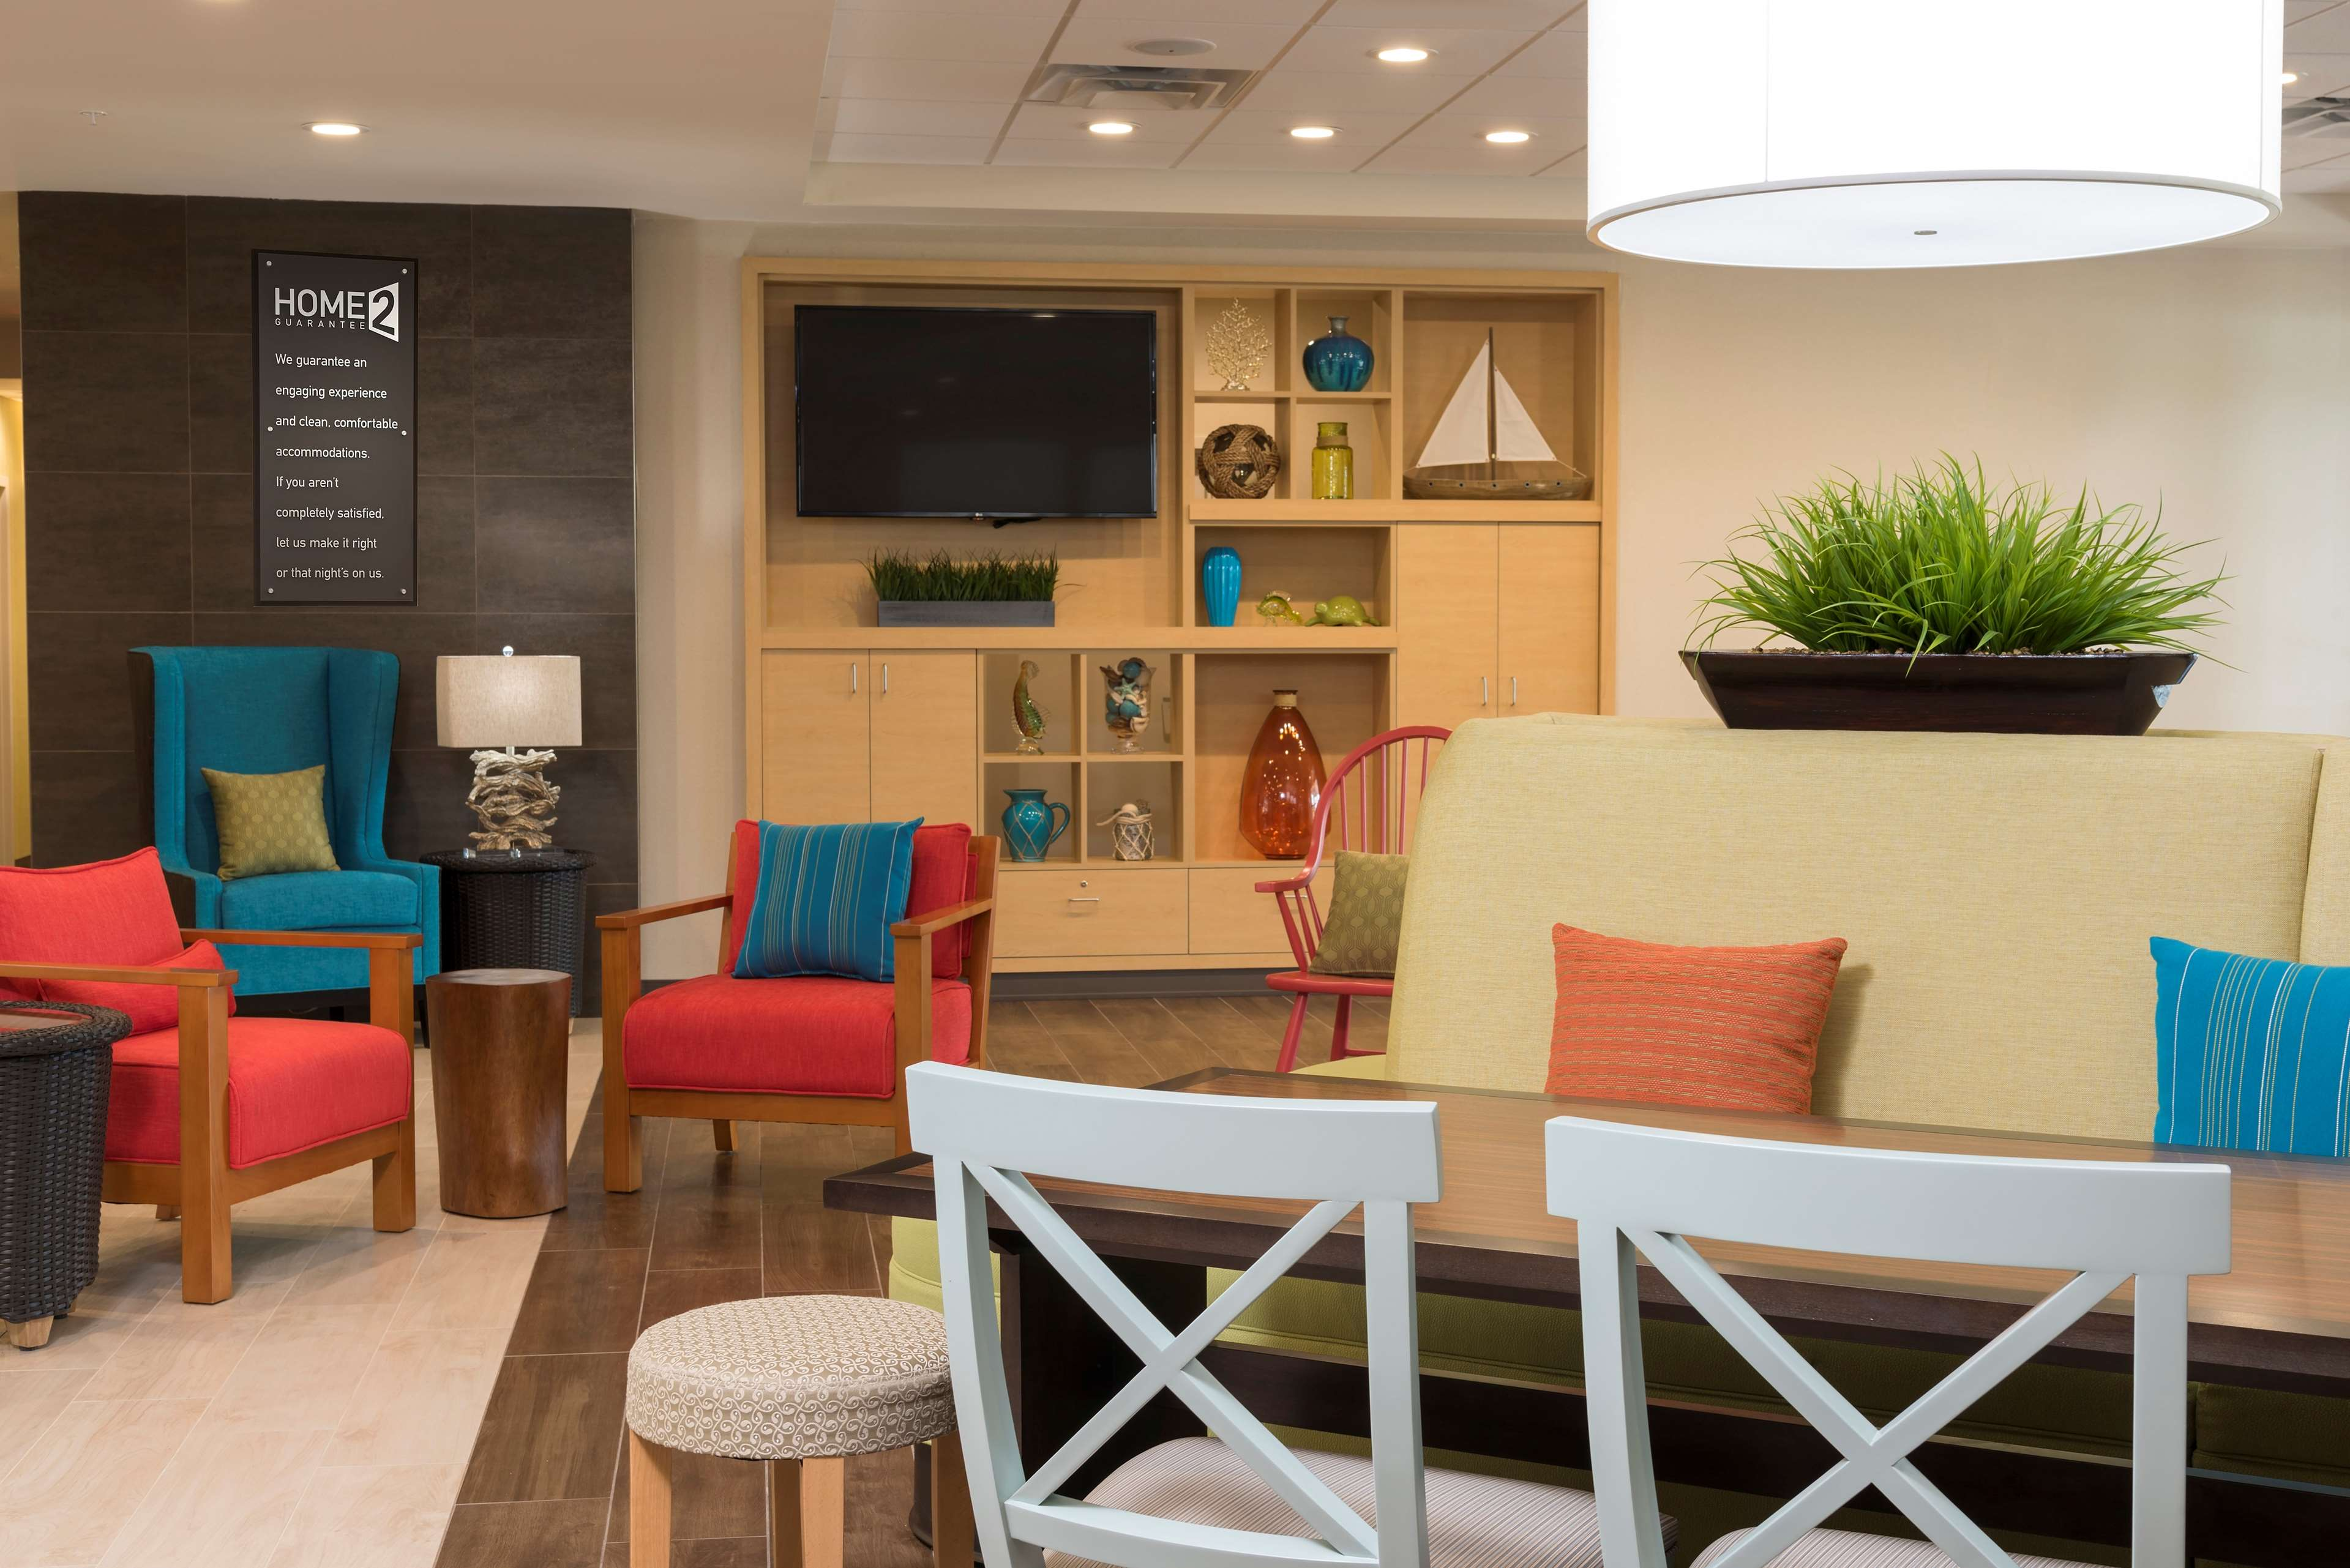 Home2 Suites by Hilton Nokomis Sarasota Casey Key image 7